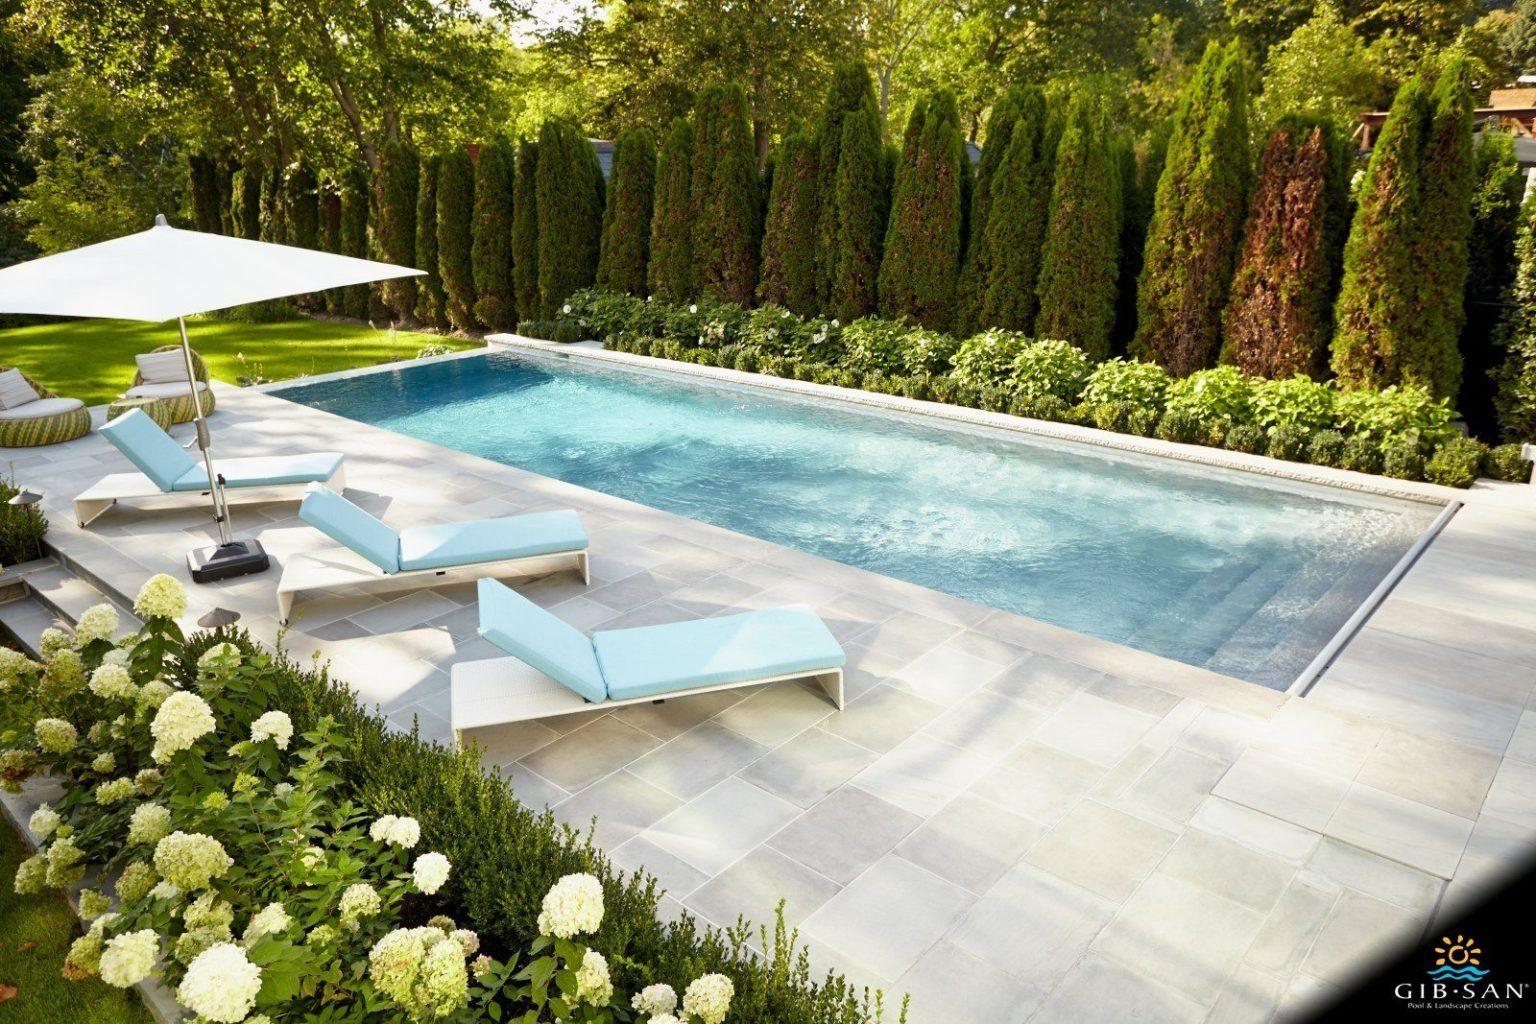 Custom Concrete Pools Gib San Pools Toronto Mississauga Oakville Backyard Pool Landscaping Small Pool Design Swimming Pools Backyard